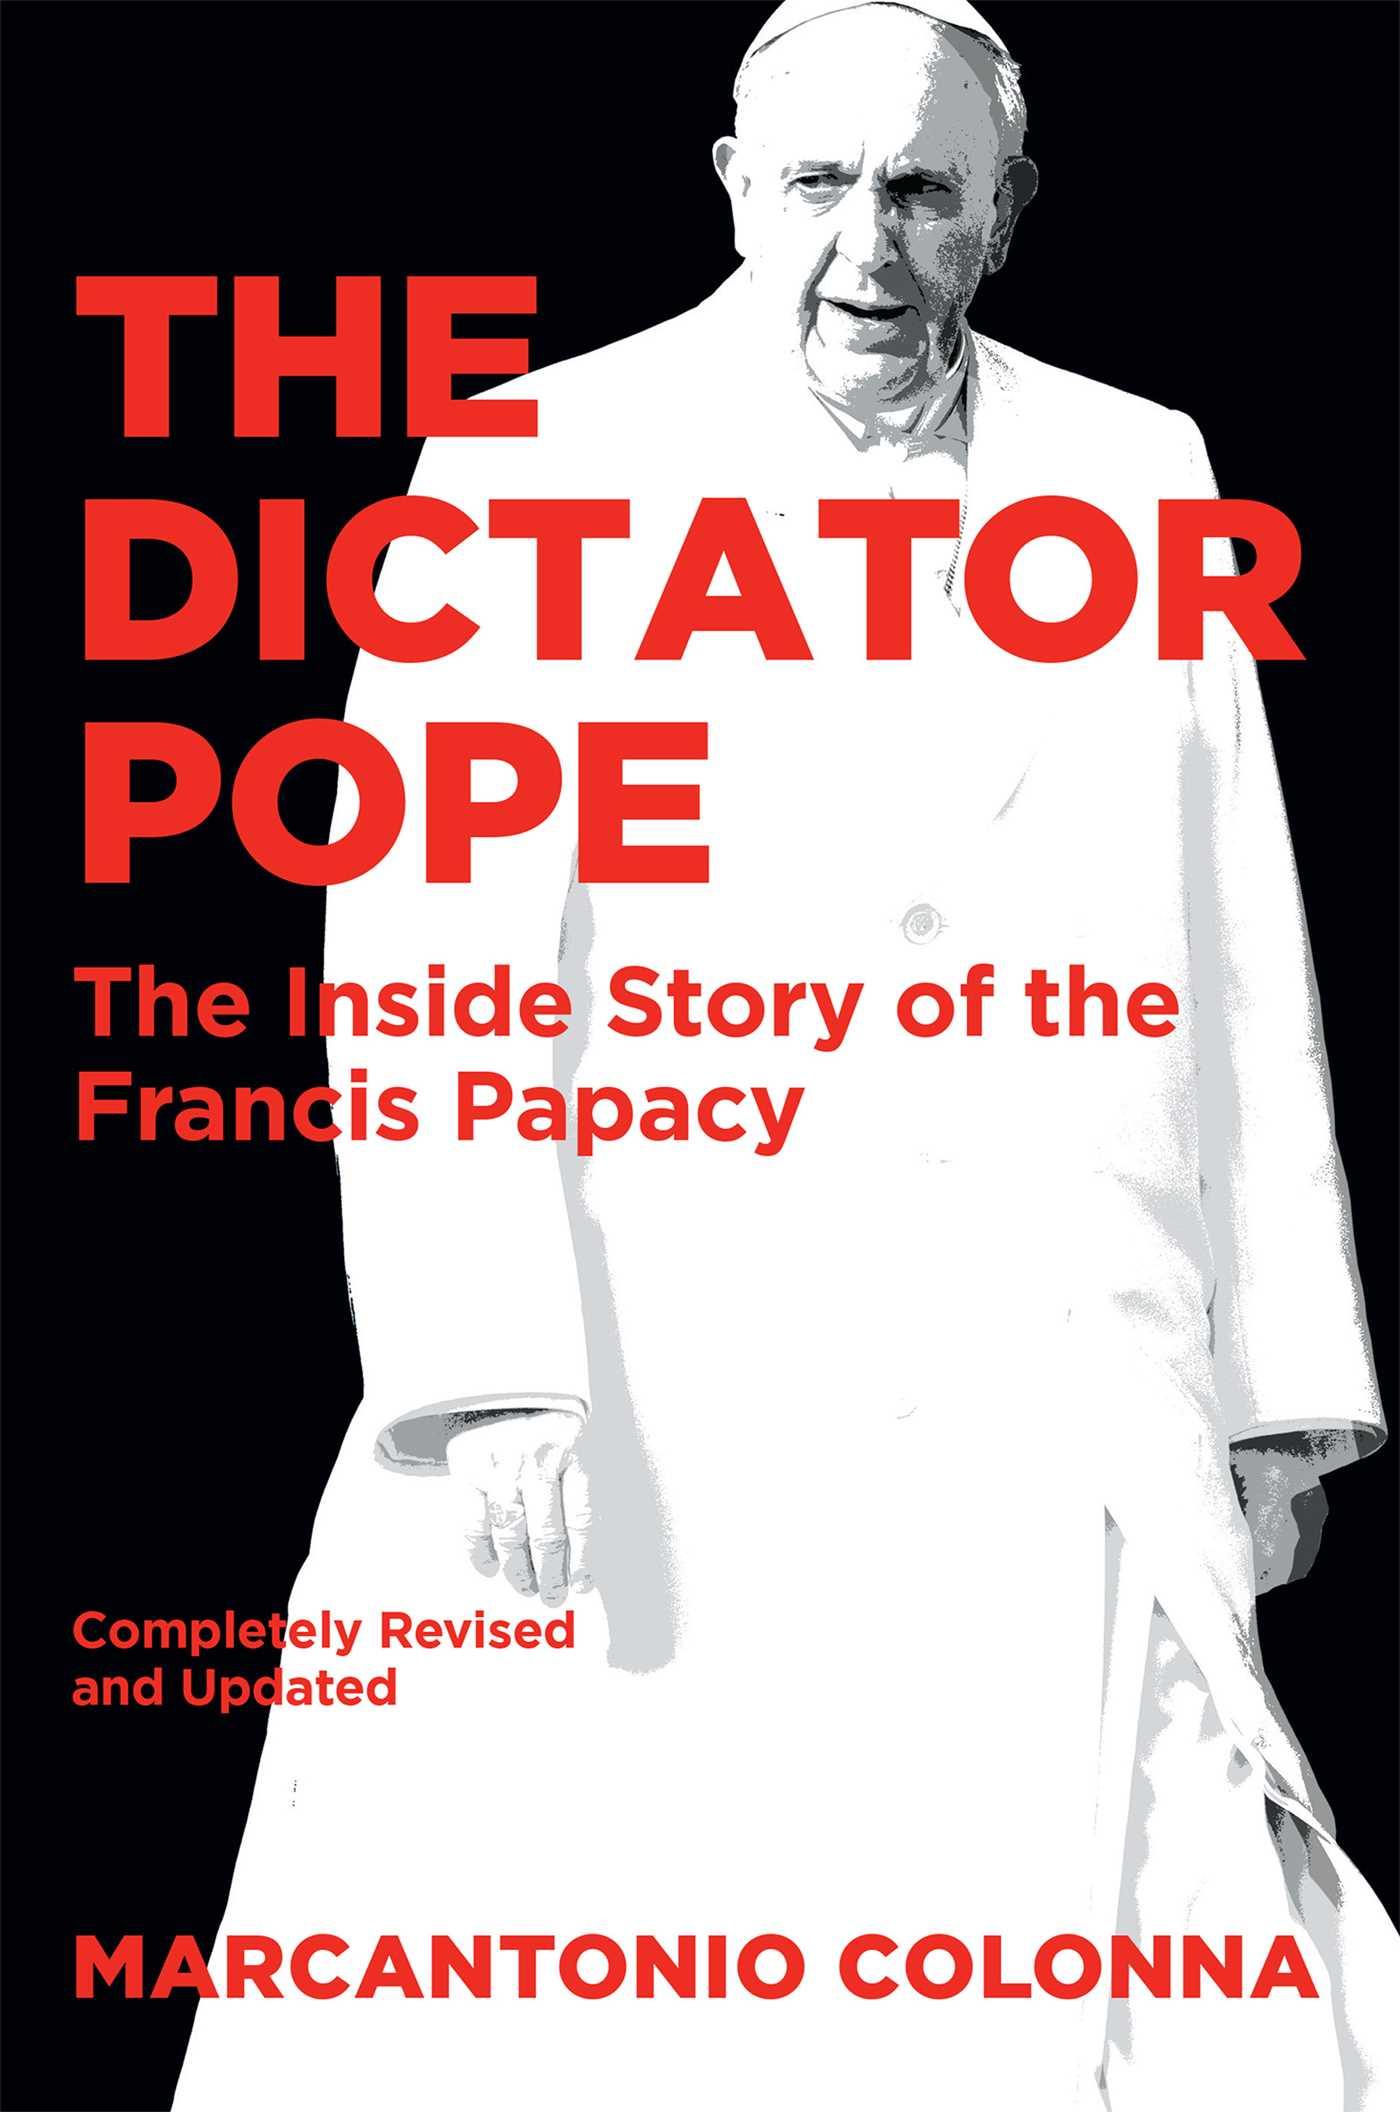 The dictator pope 9781621578338 hr